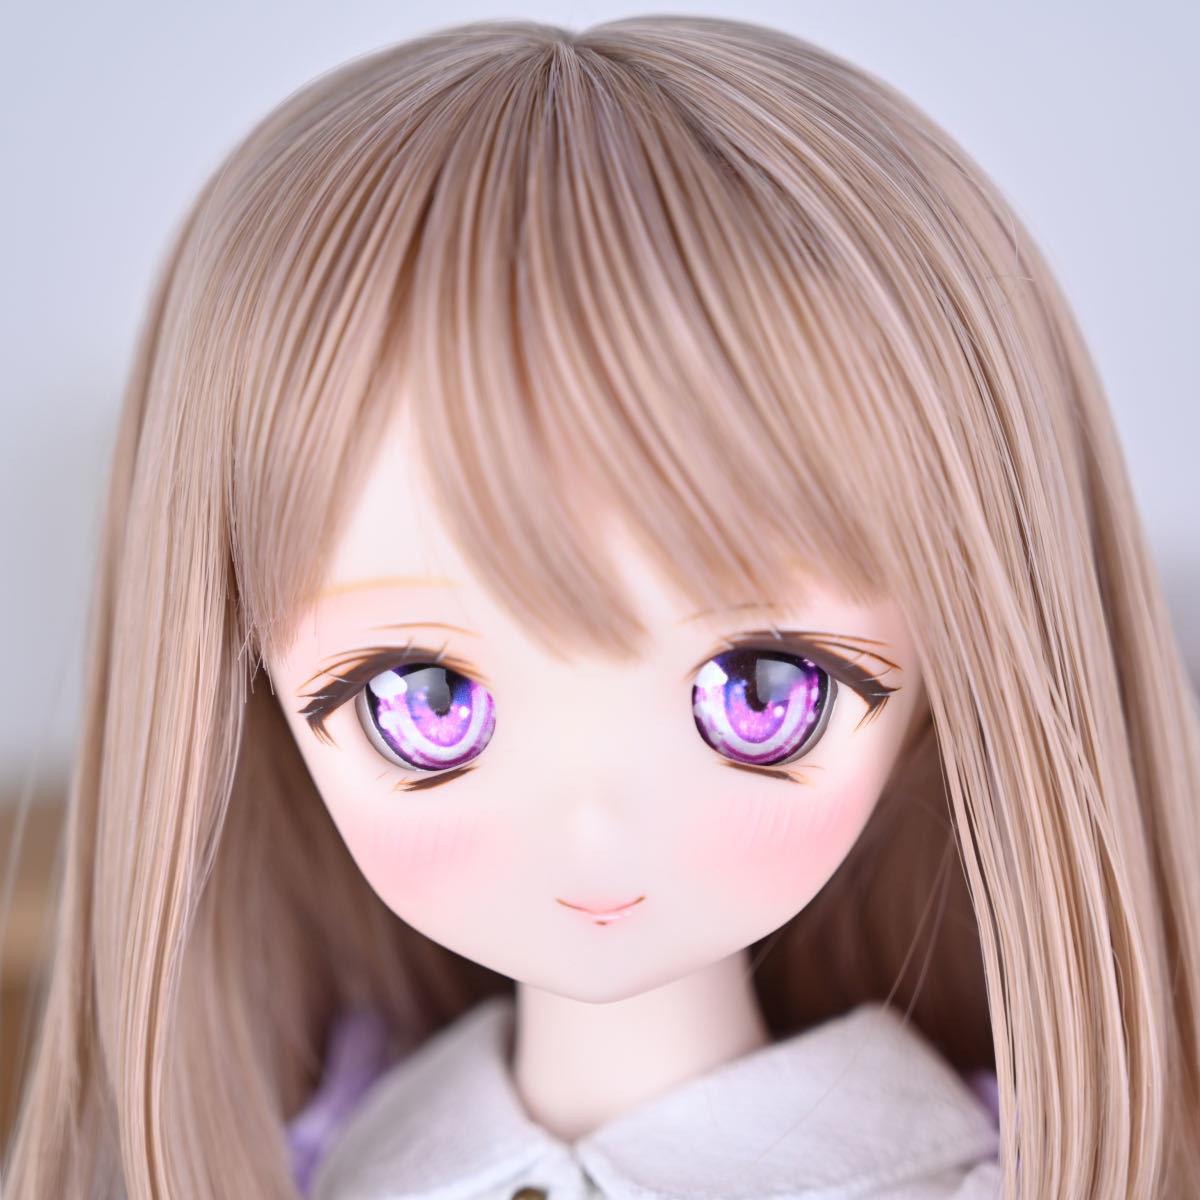 【Forest Lily】DDH-01 セミホワイト肌 カスタムヘッド レジンアイ DD ボークス BJD _画像1